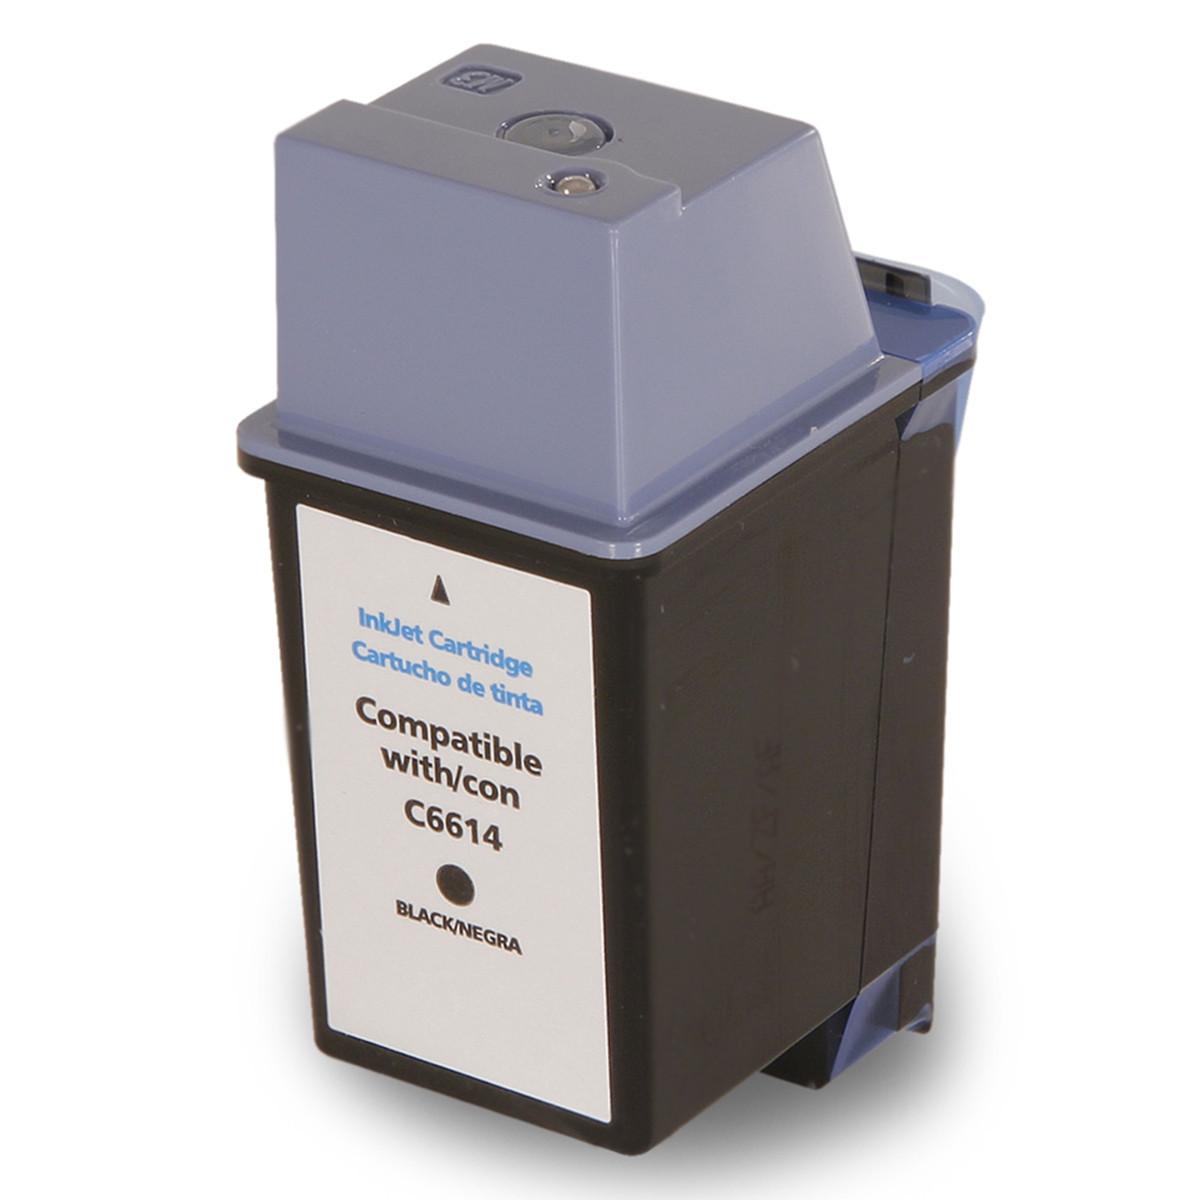 Cartucho de Tinta Compatível com HP 20 C6614D Preto | Deskjet 610C Deskjet 612C Deskjet 630C | 38ml